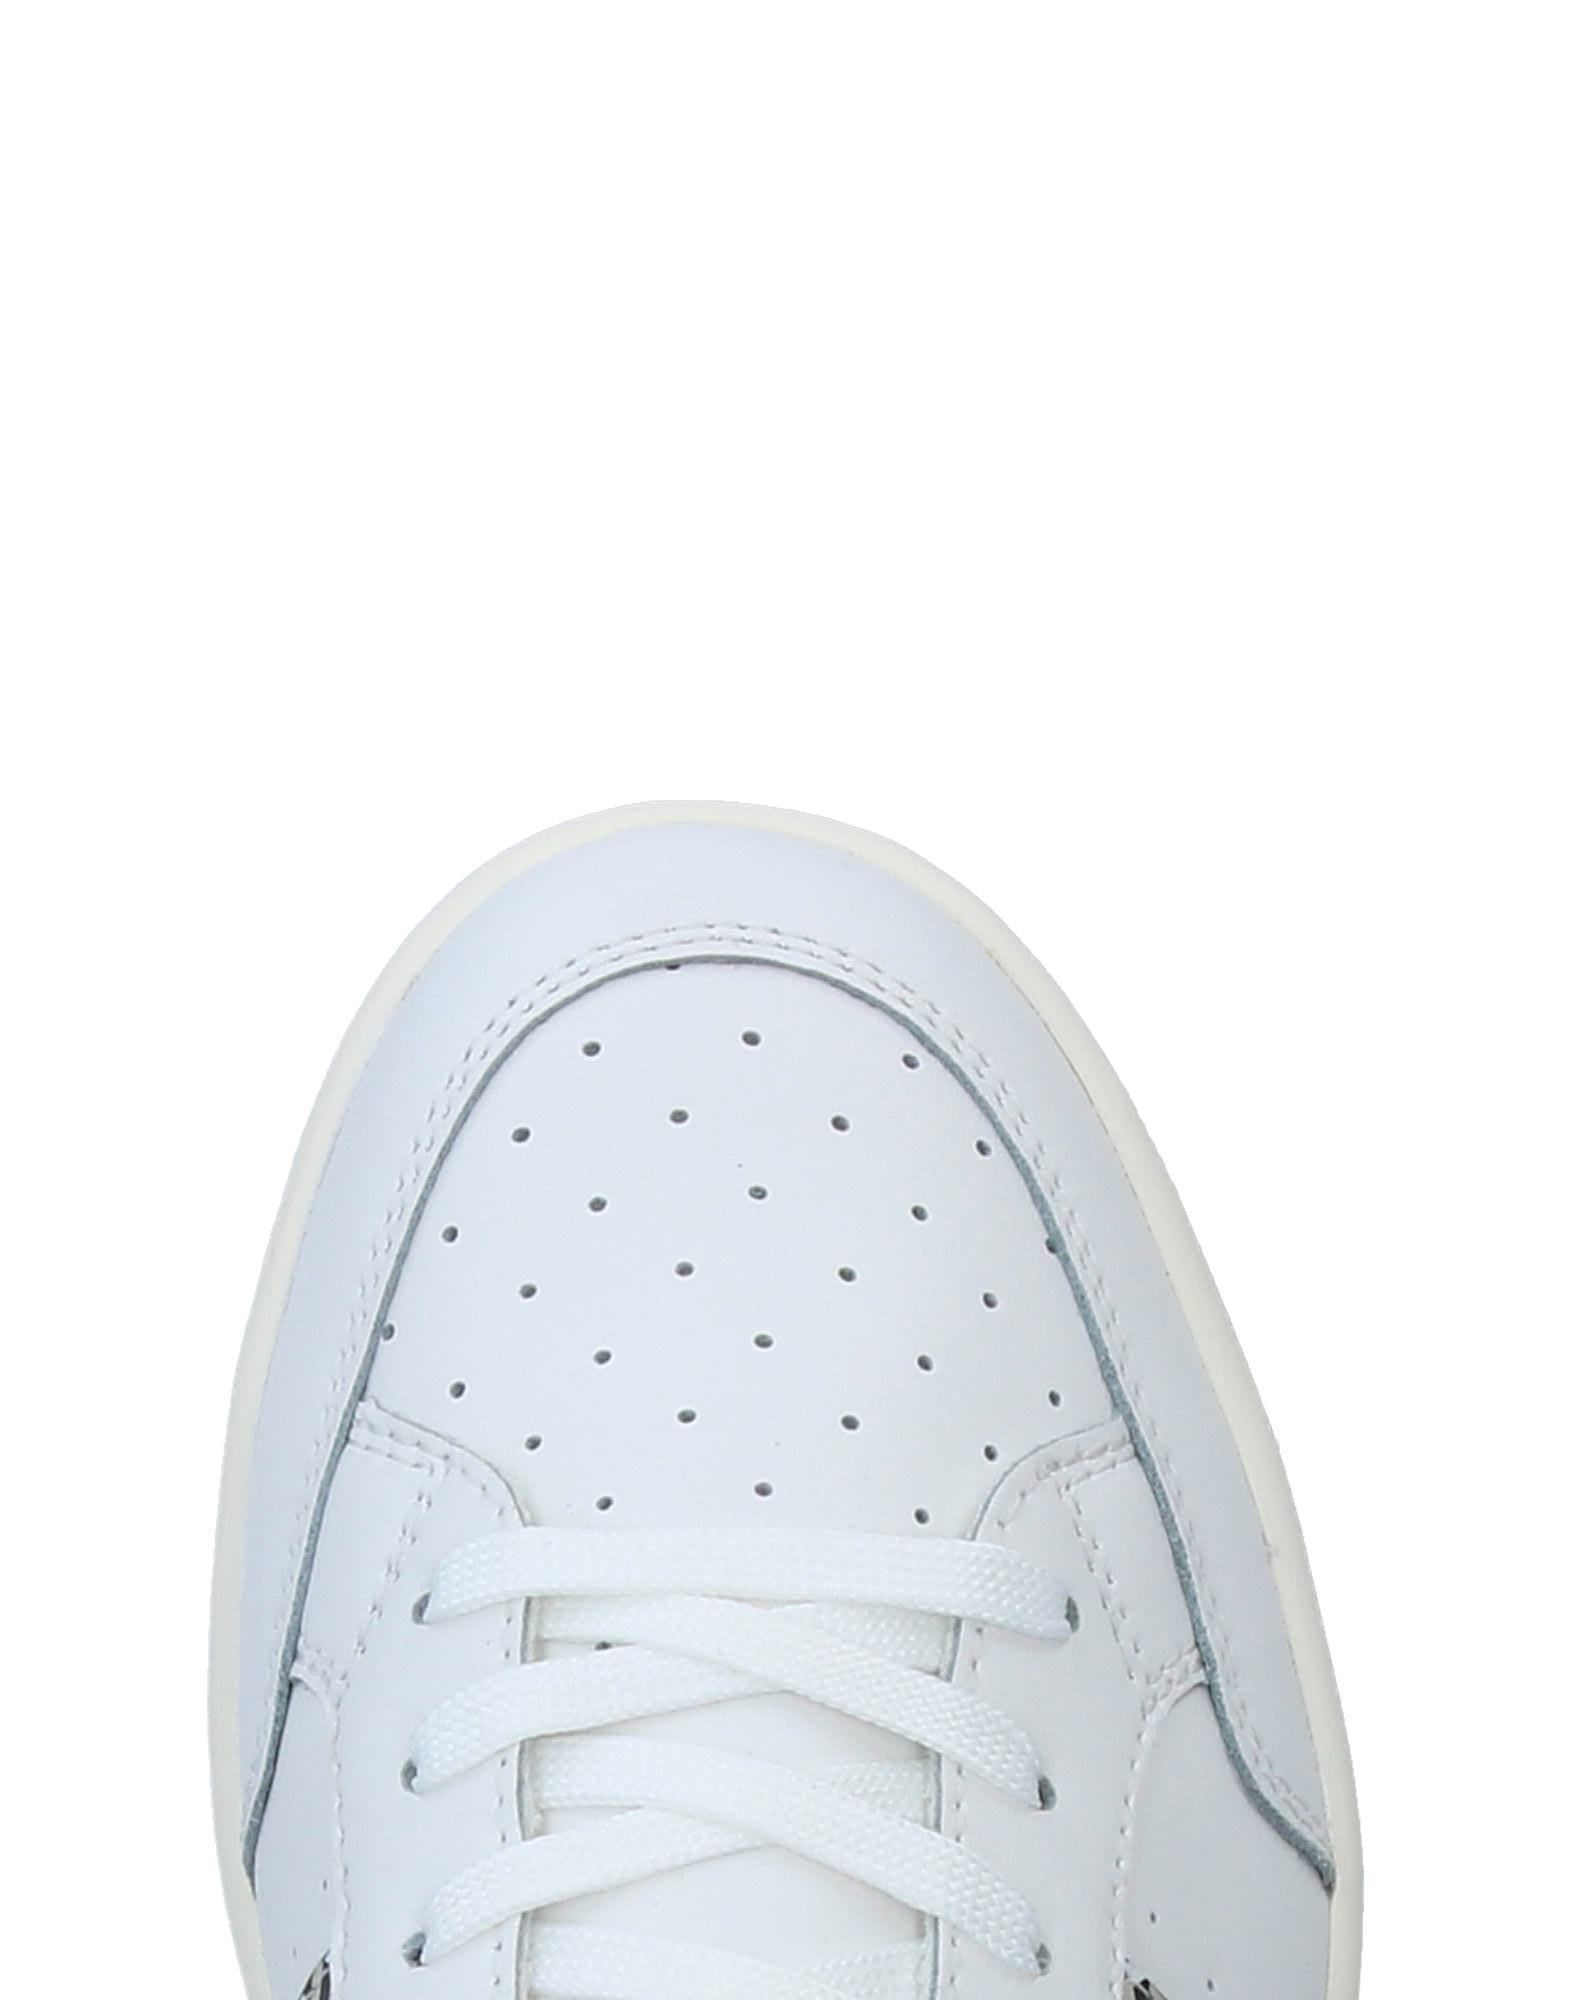 Arts Moa Master Of Arts  Sneakers Herren  11333548VA 030b2b